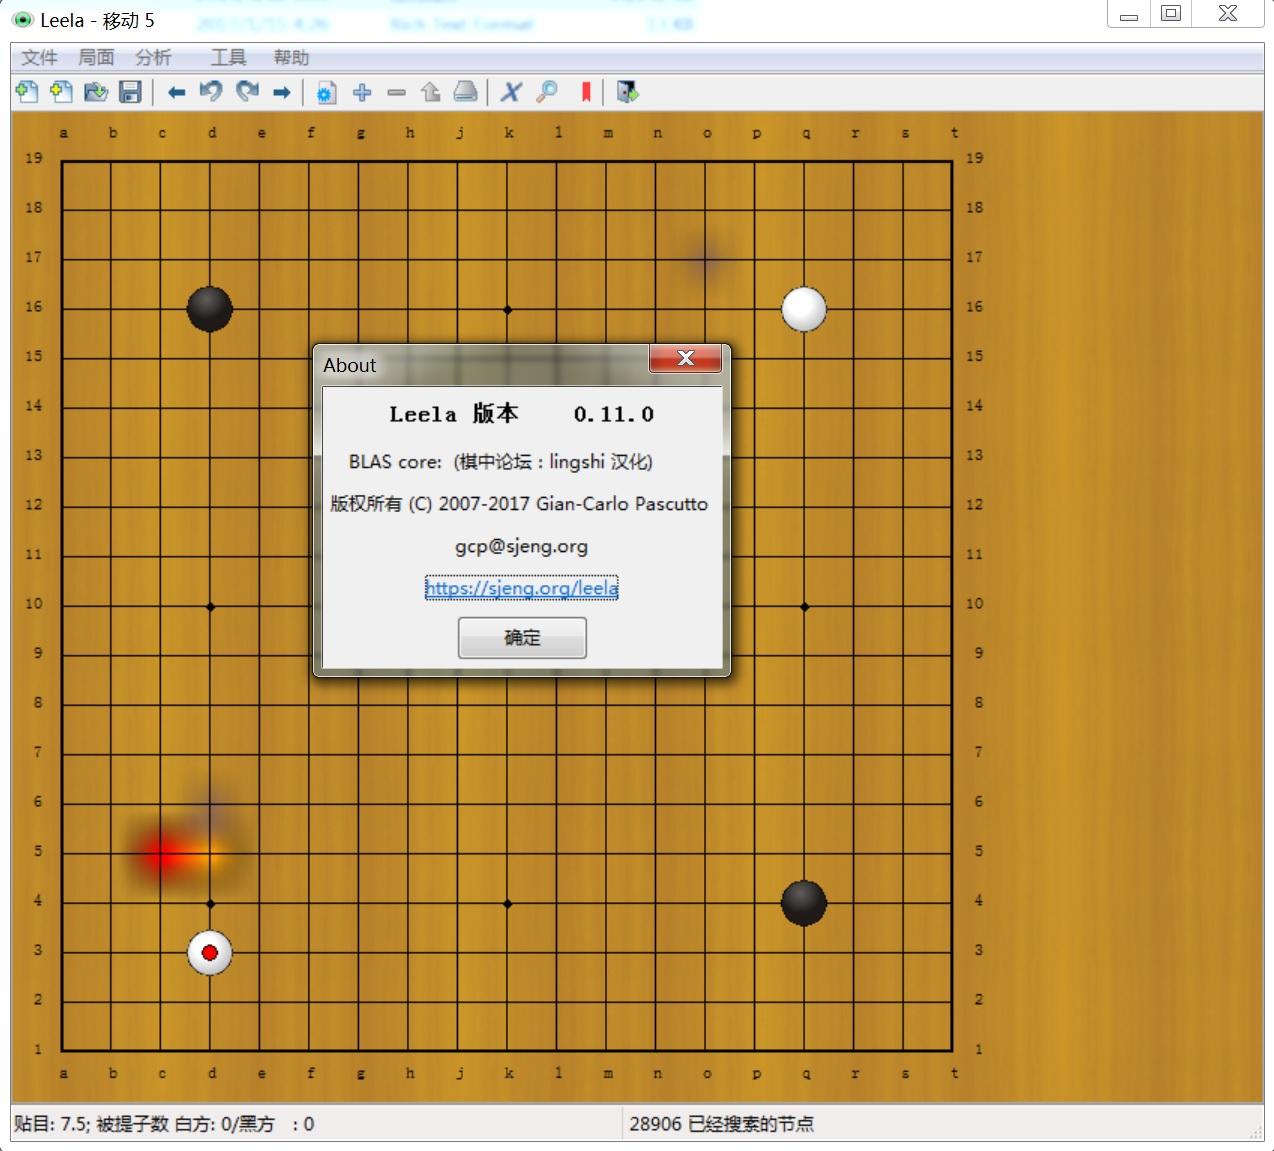 Leela丽拉围棋0110汉化版里拉围棋中文版